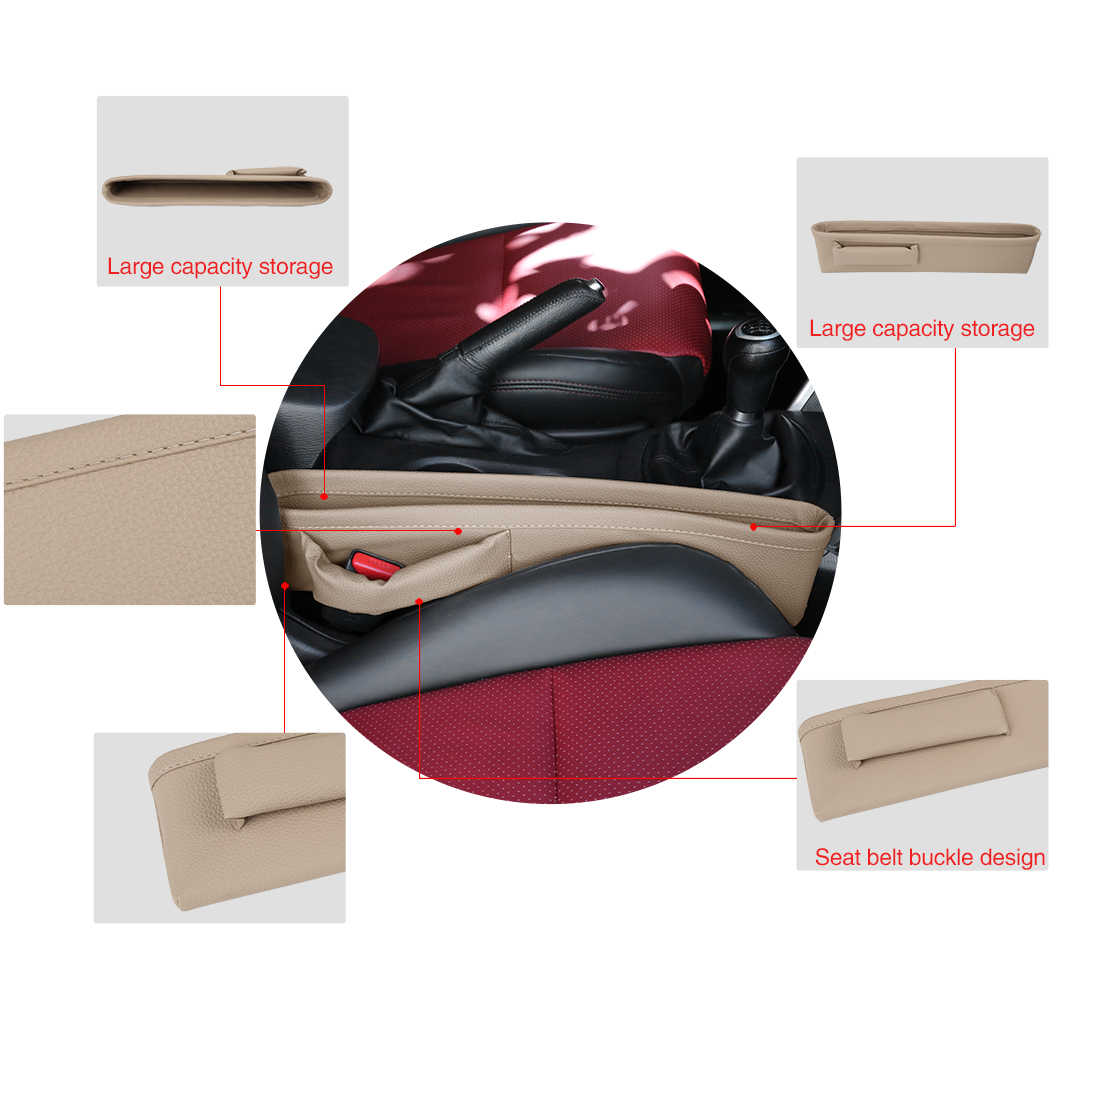 Uxcell Lederen Autostoel Gap Filler Zakken Multifunction Auto Zetels Pad Zachte Padding Telefoon Kaarten Houder Opslag Organisatoren